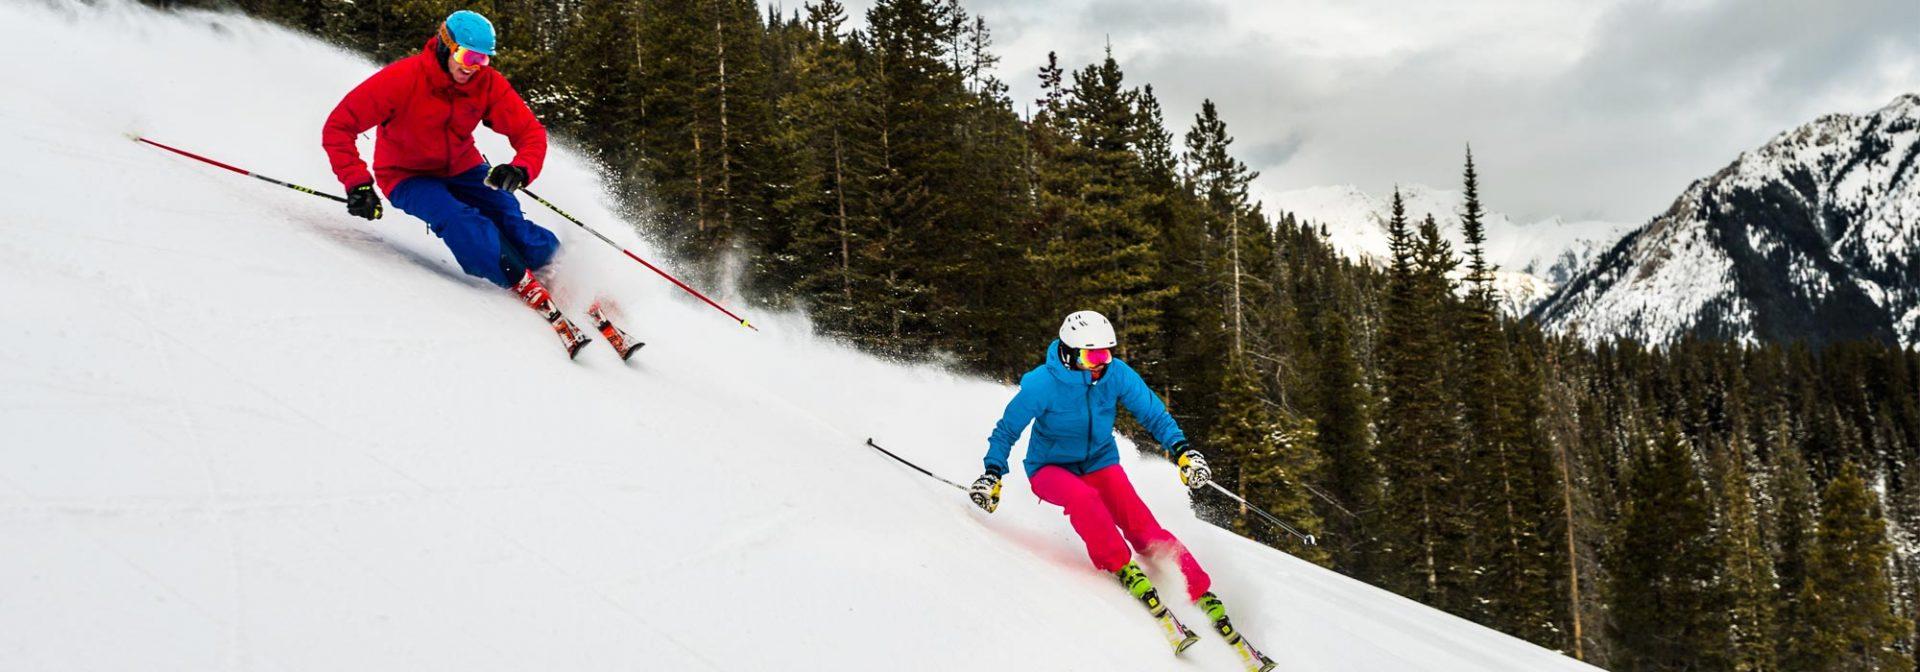 Ski Fitness Exercises